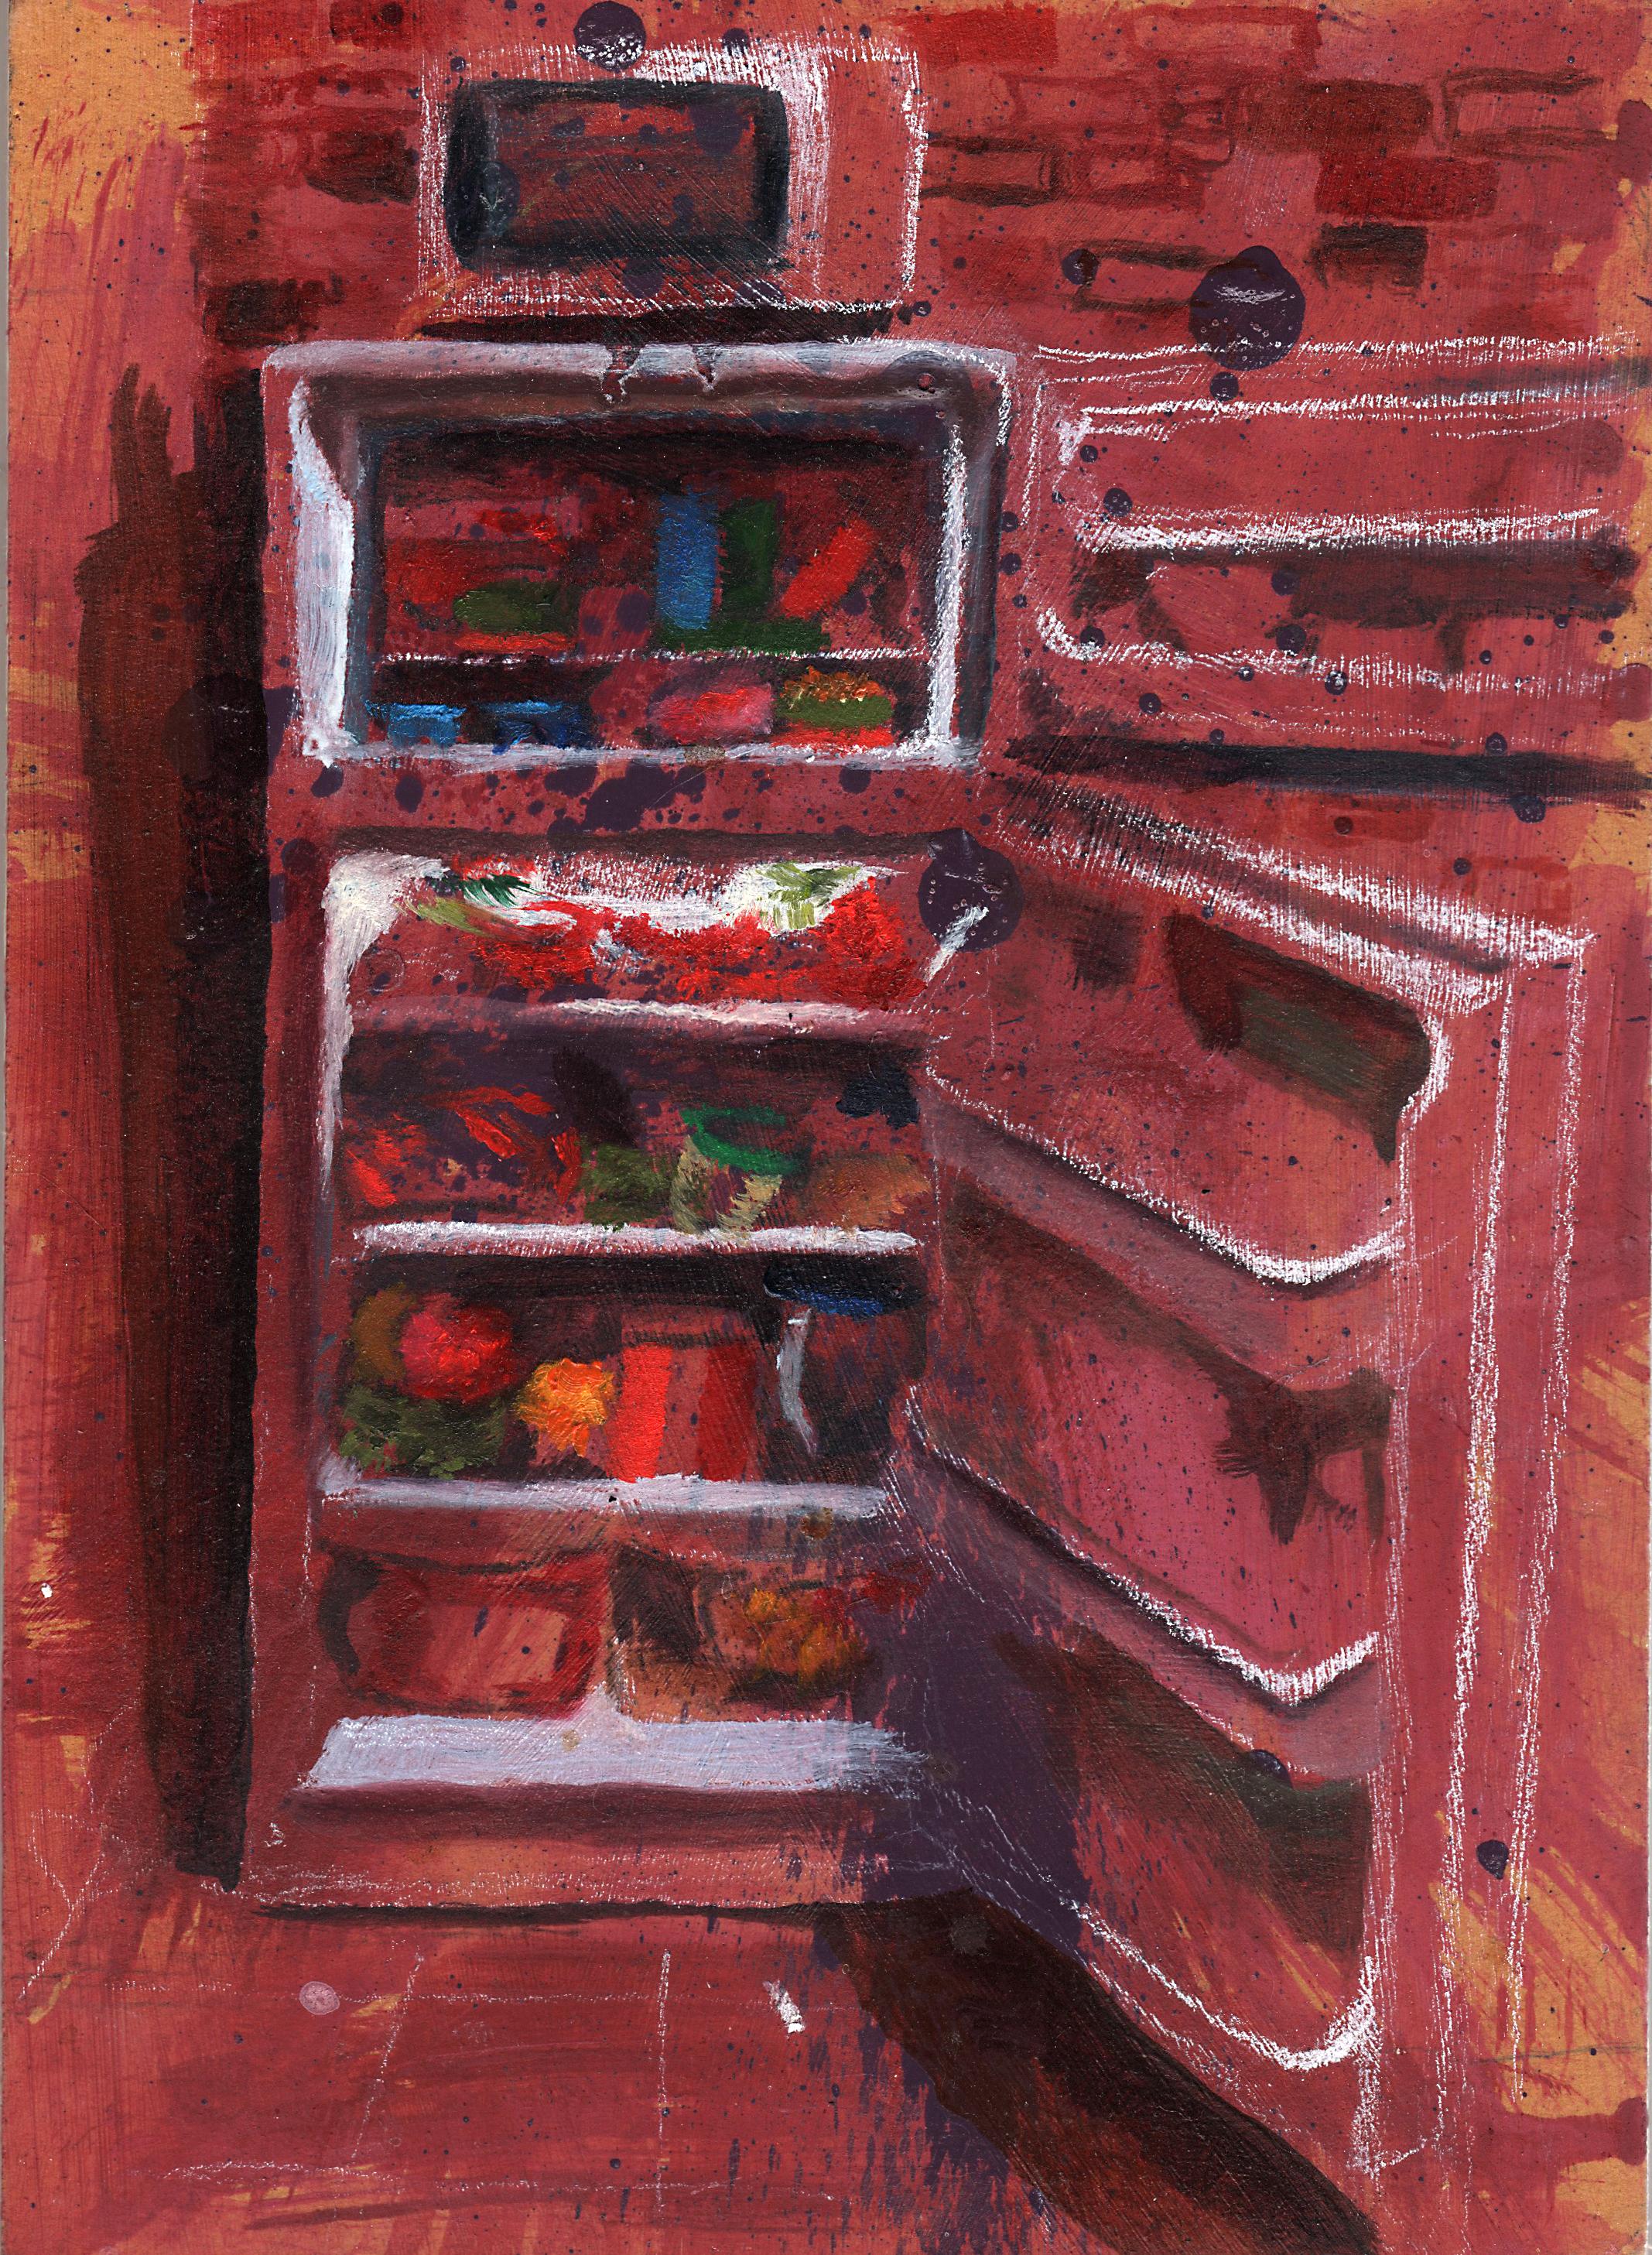 Old Refrigerator, New Food